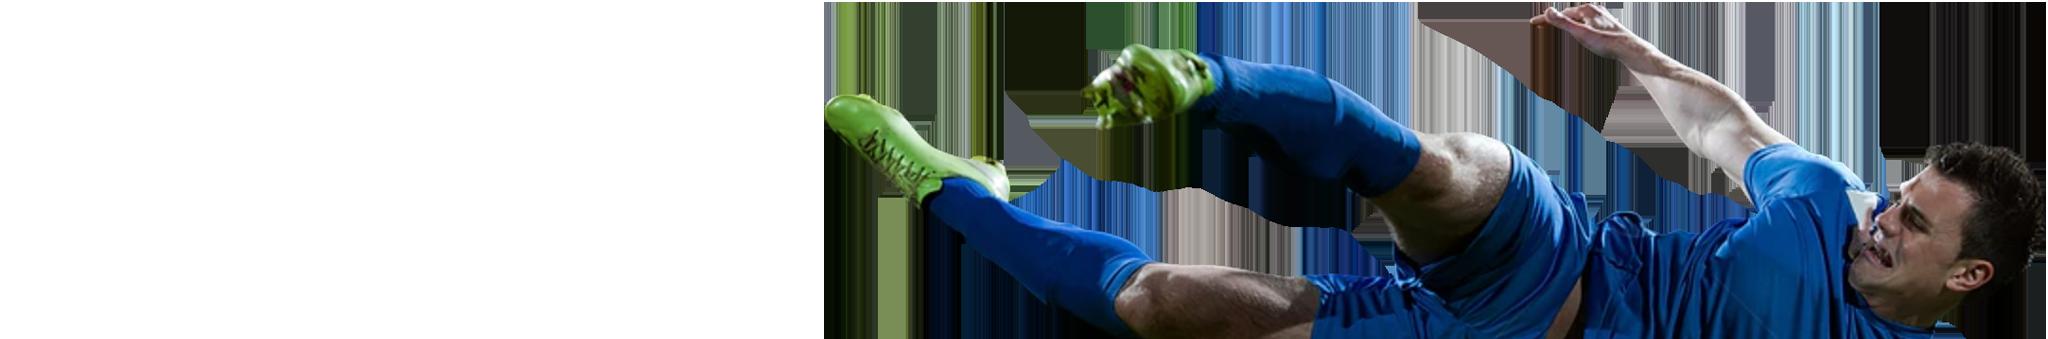 https://www.olimpiasport.it/wp-content/uploads/2019/02/calciatore_fondo_1.png